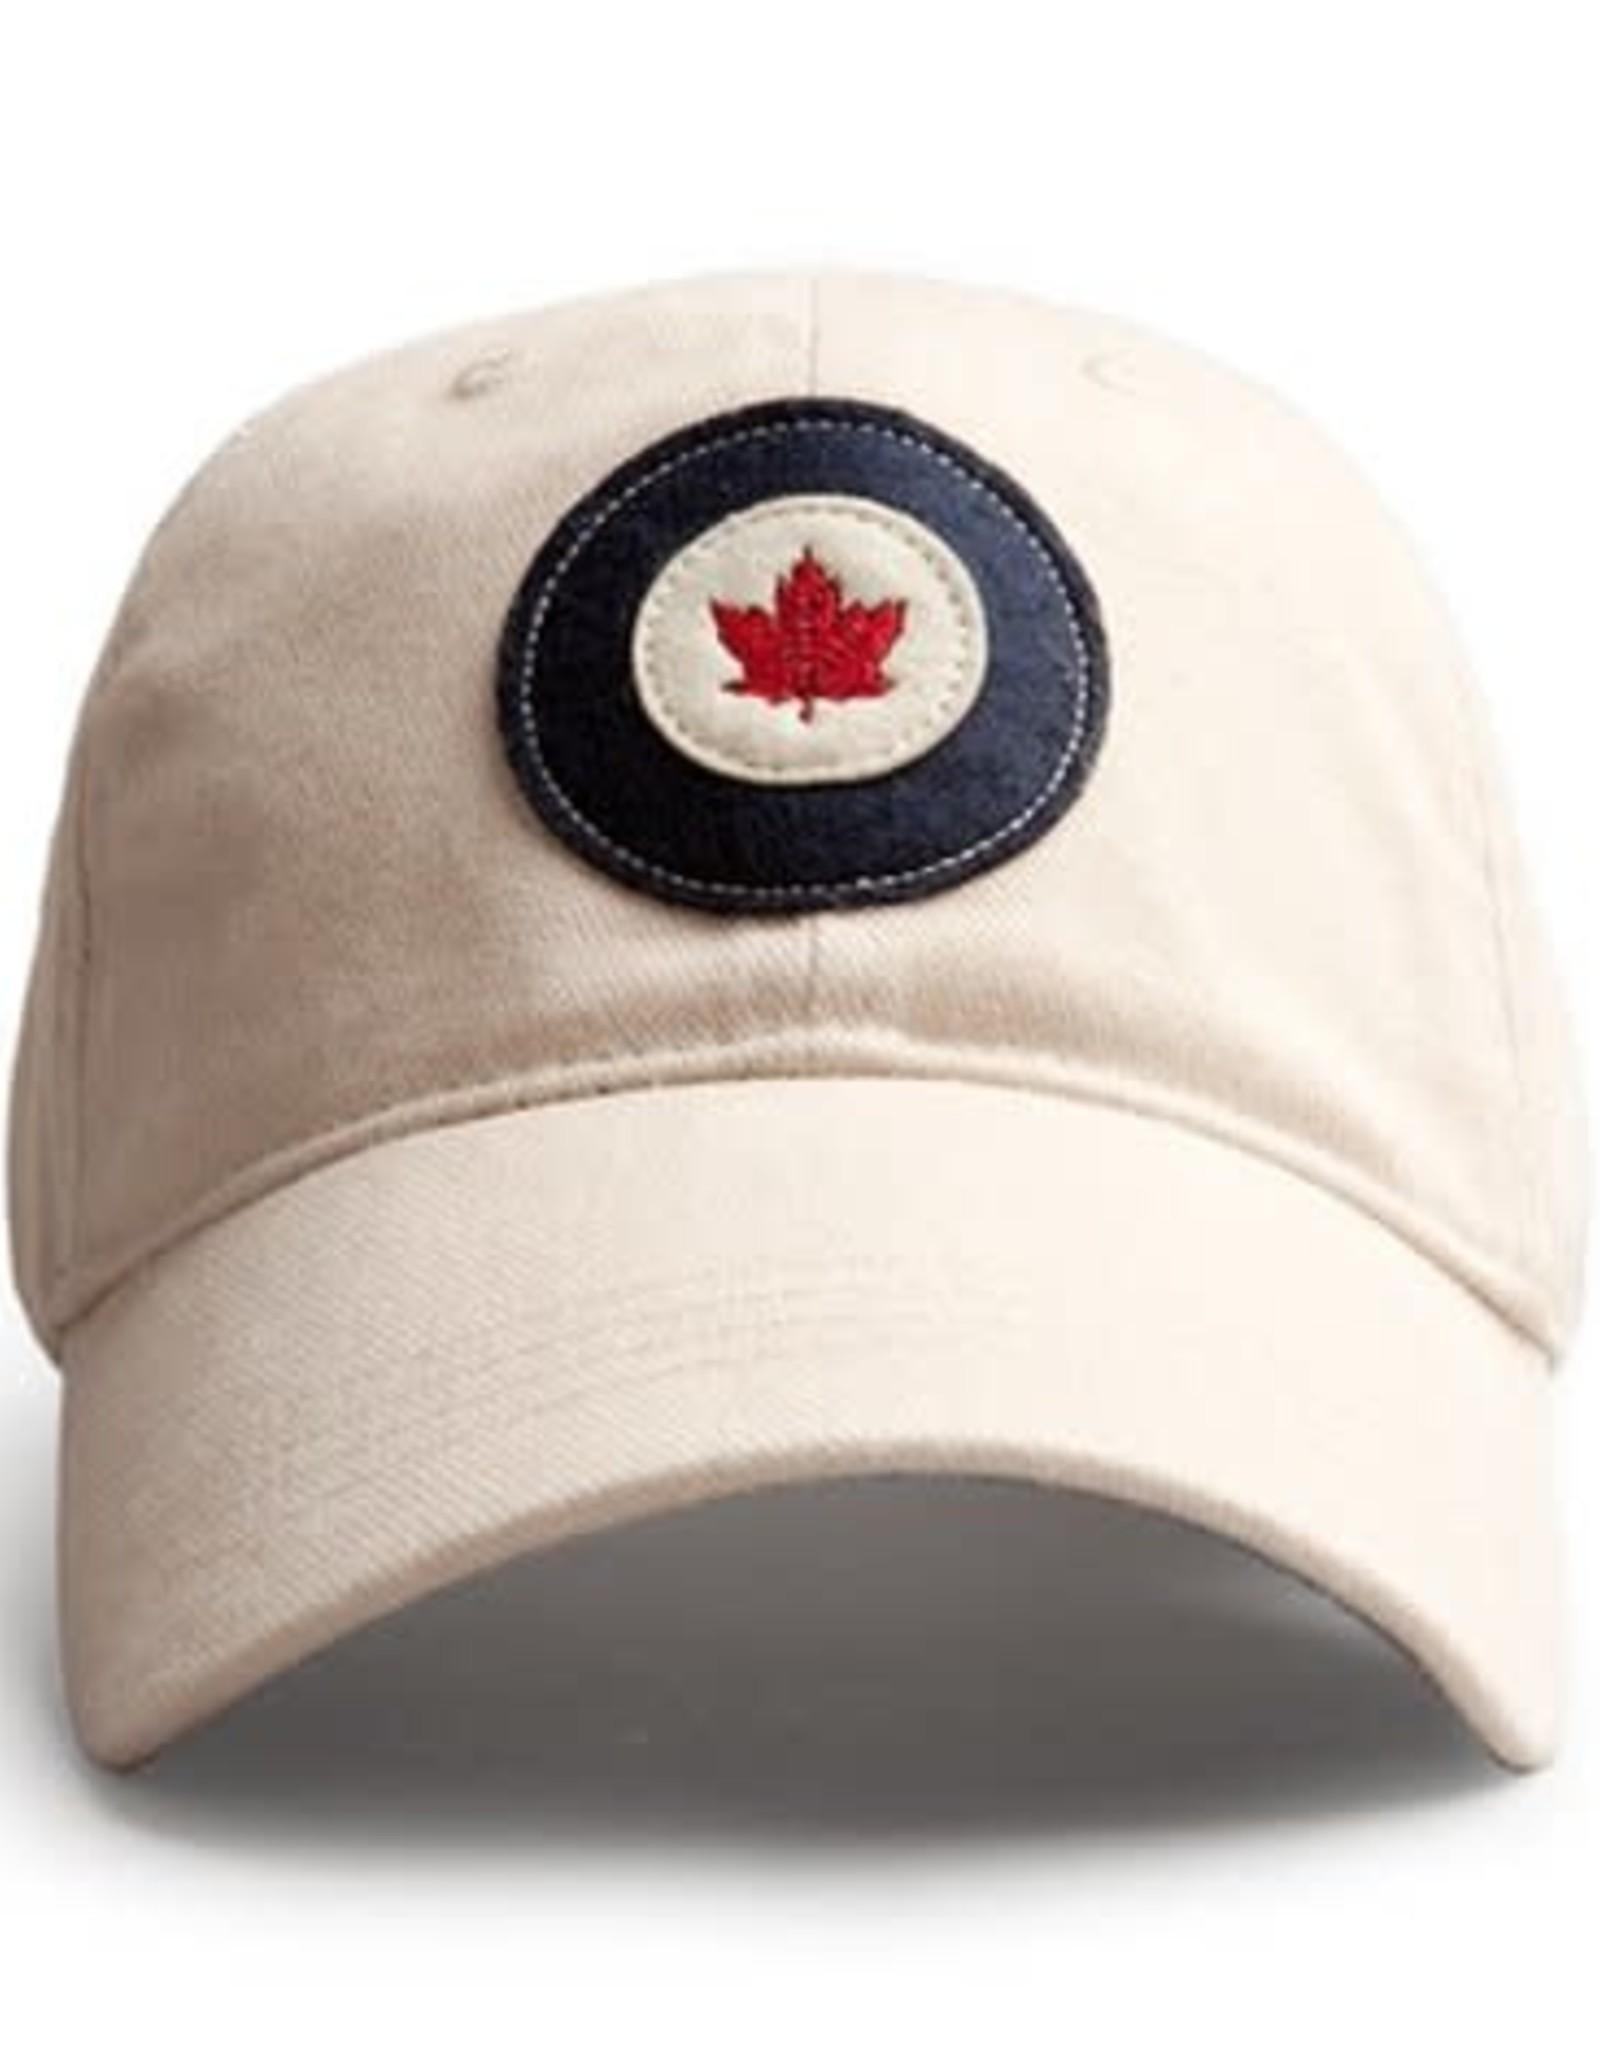 RED CANOE Red Canoe RCAF Kids Cap